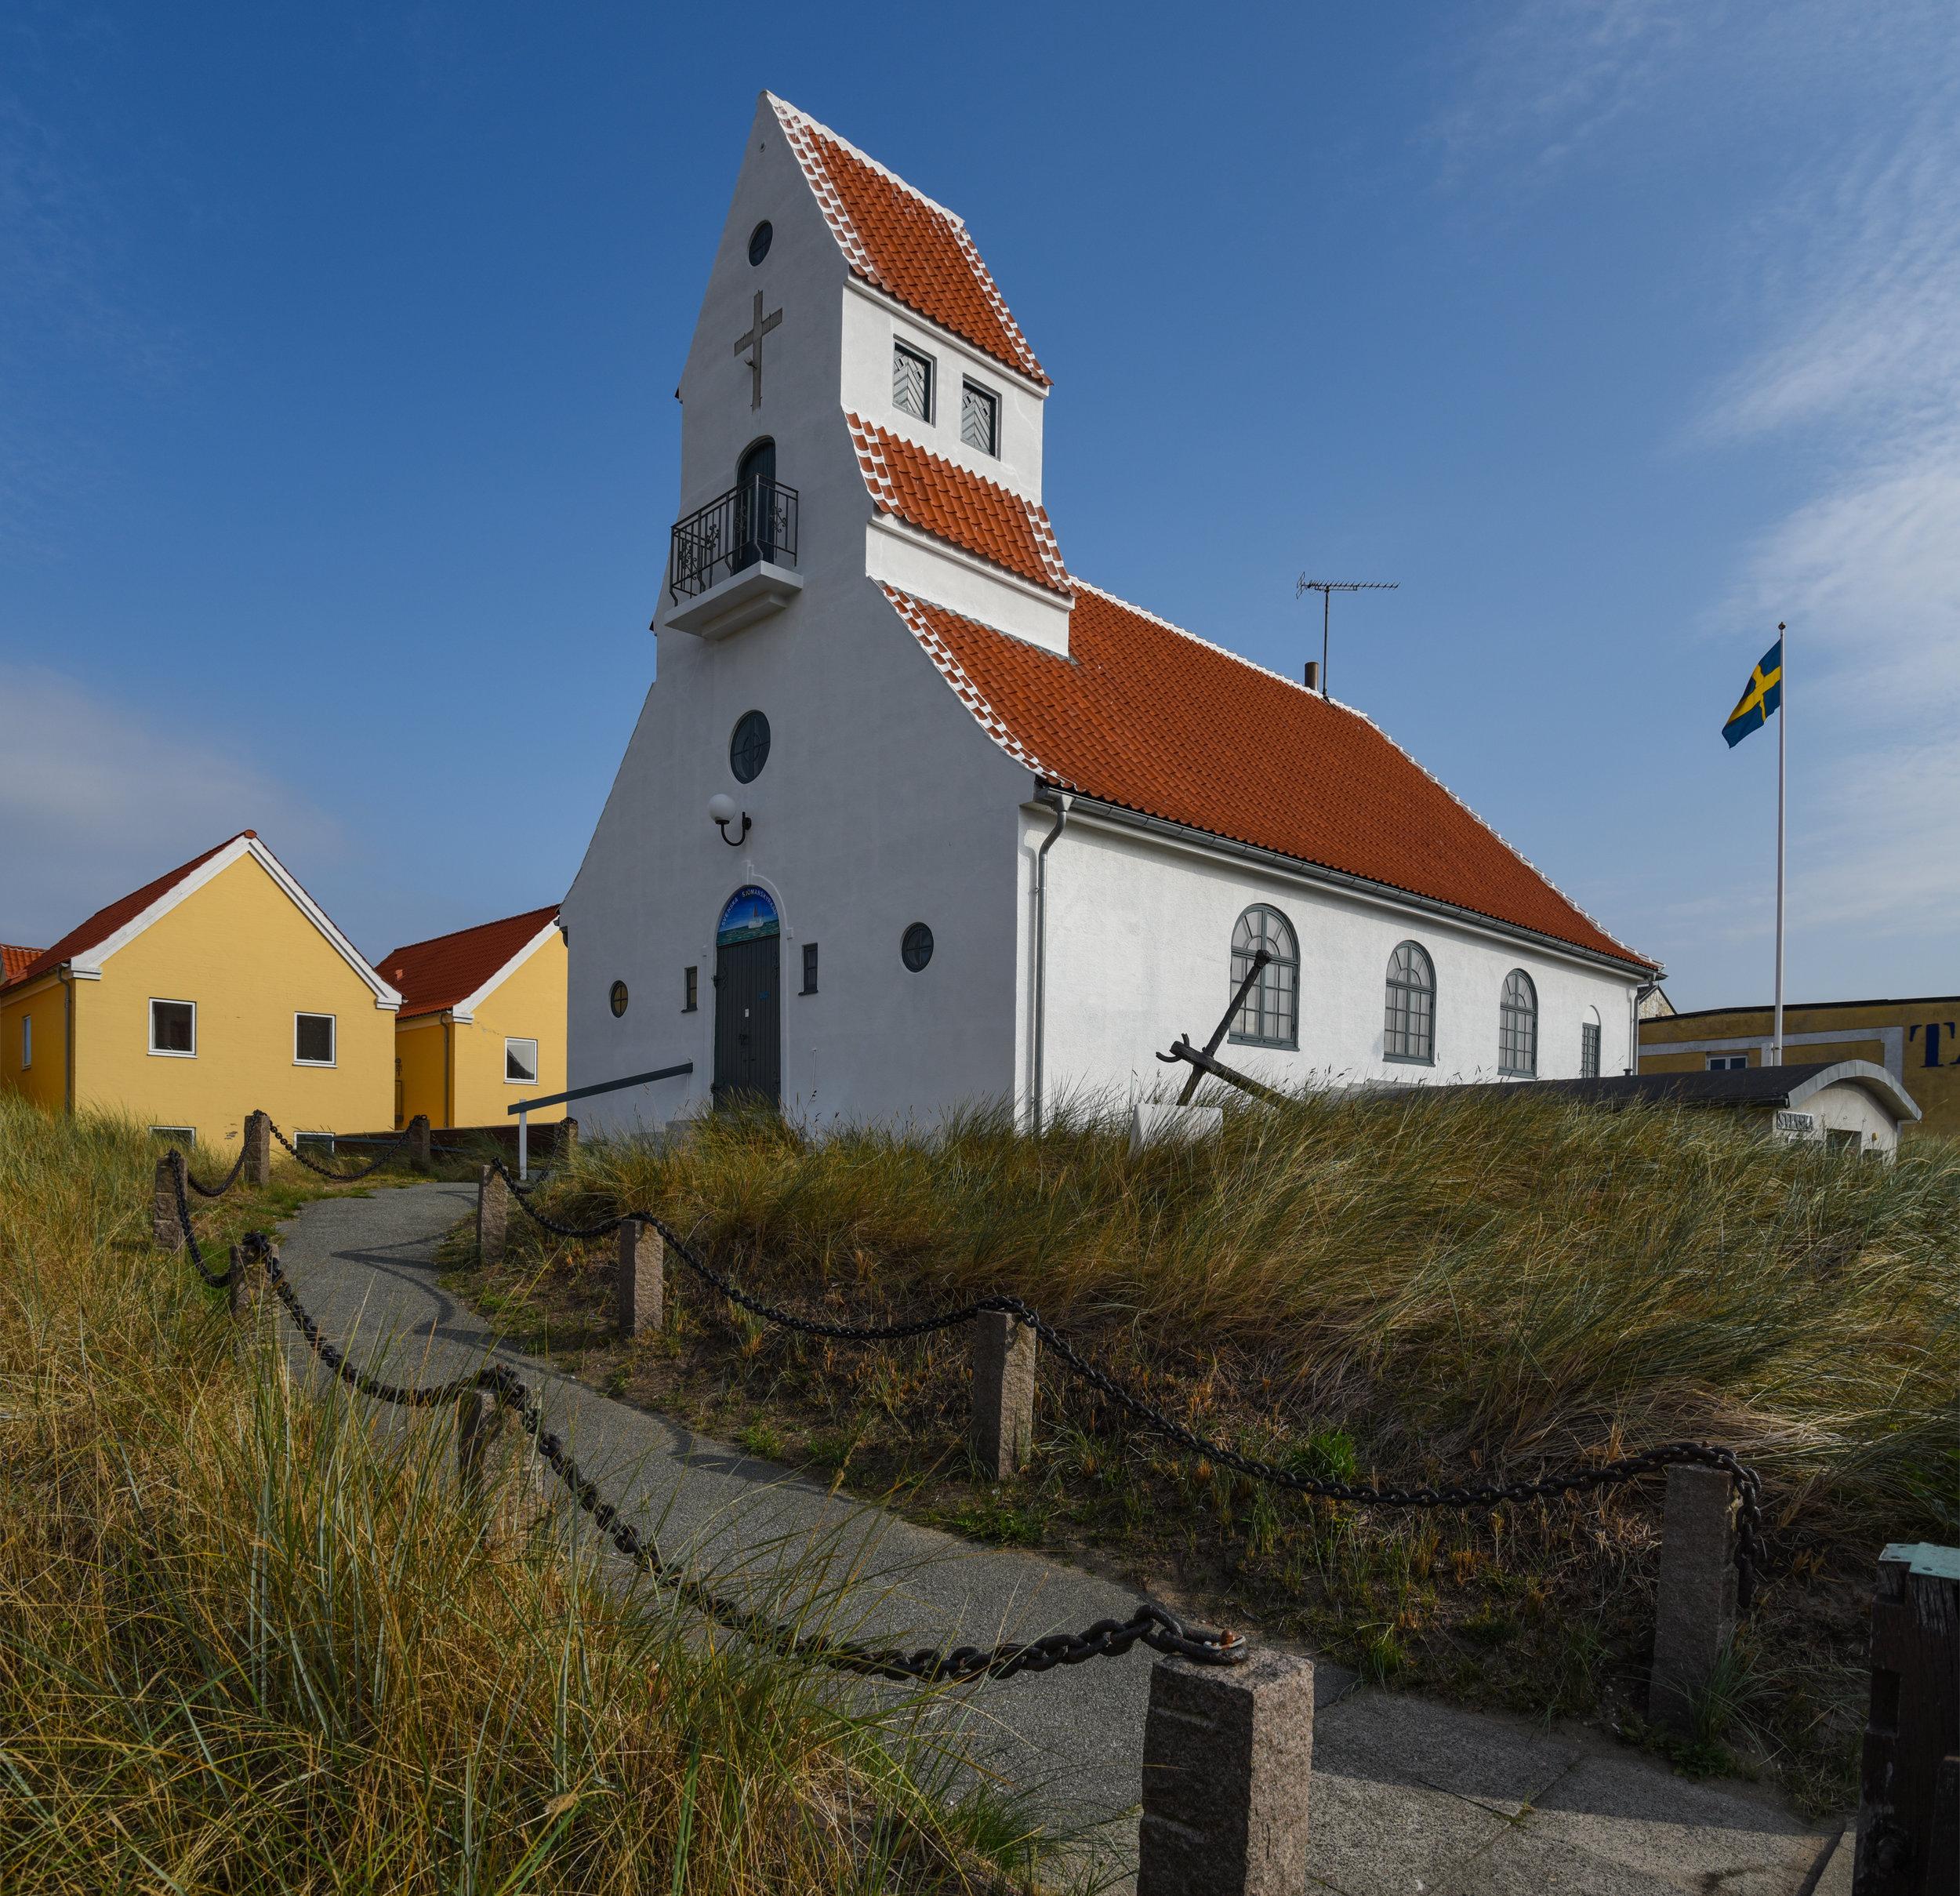 A small church is Skagen Denmark.